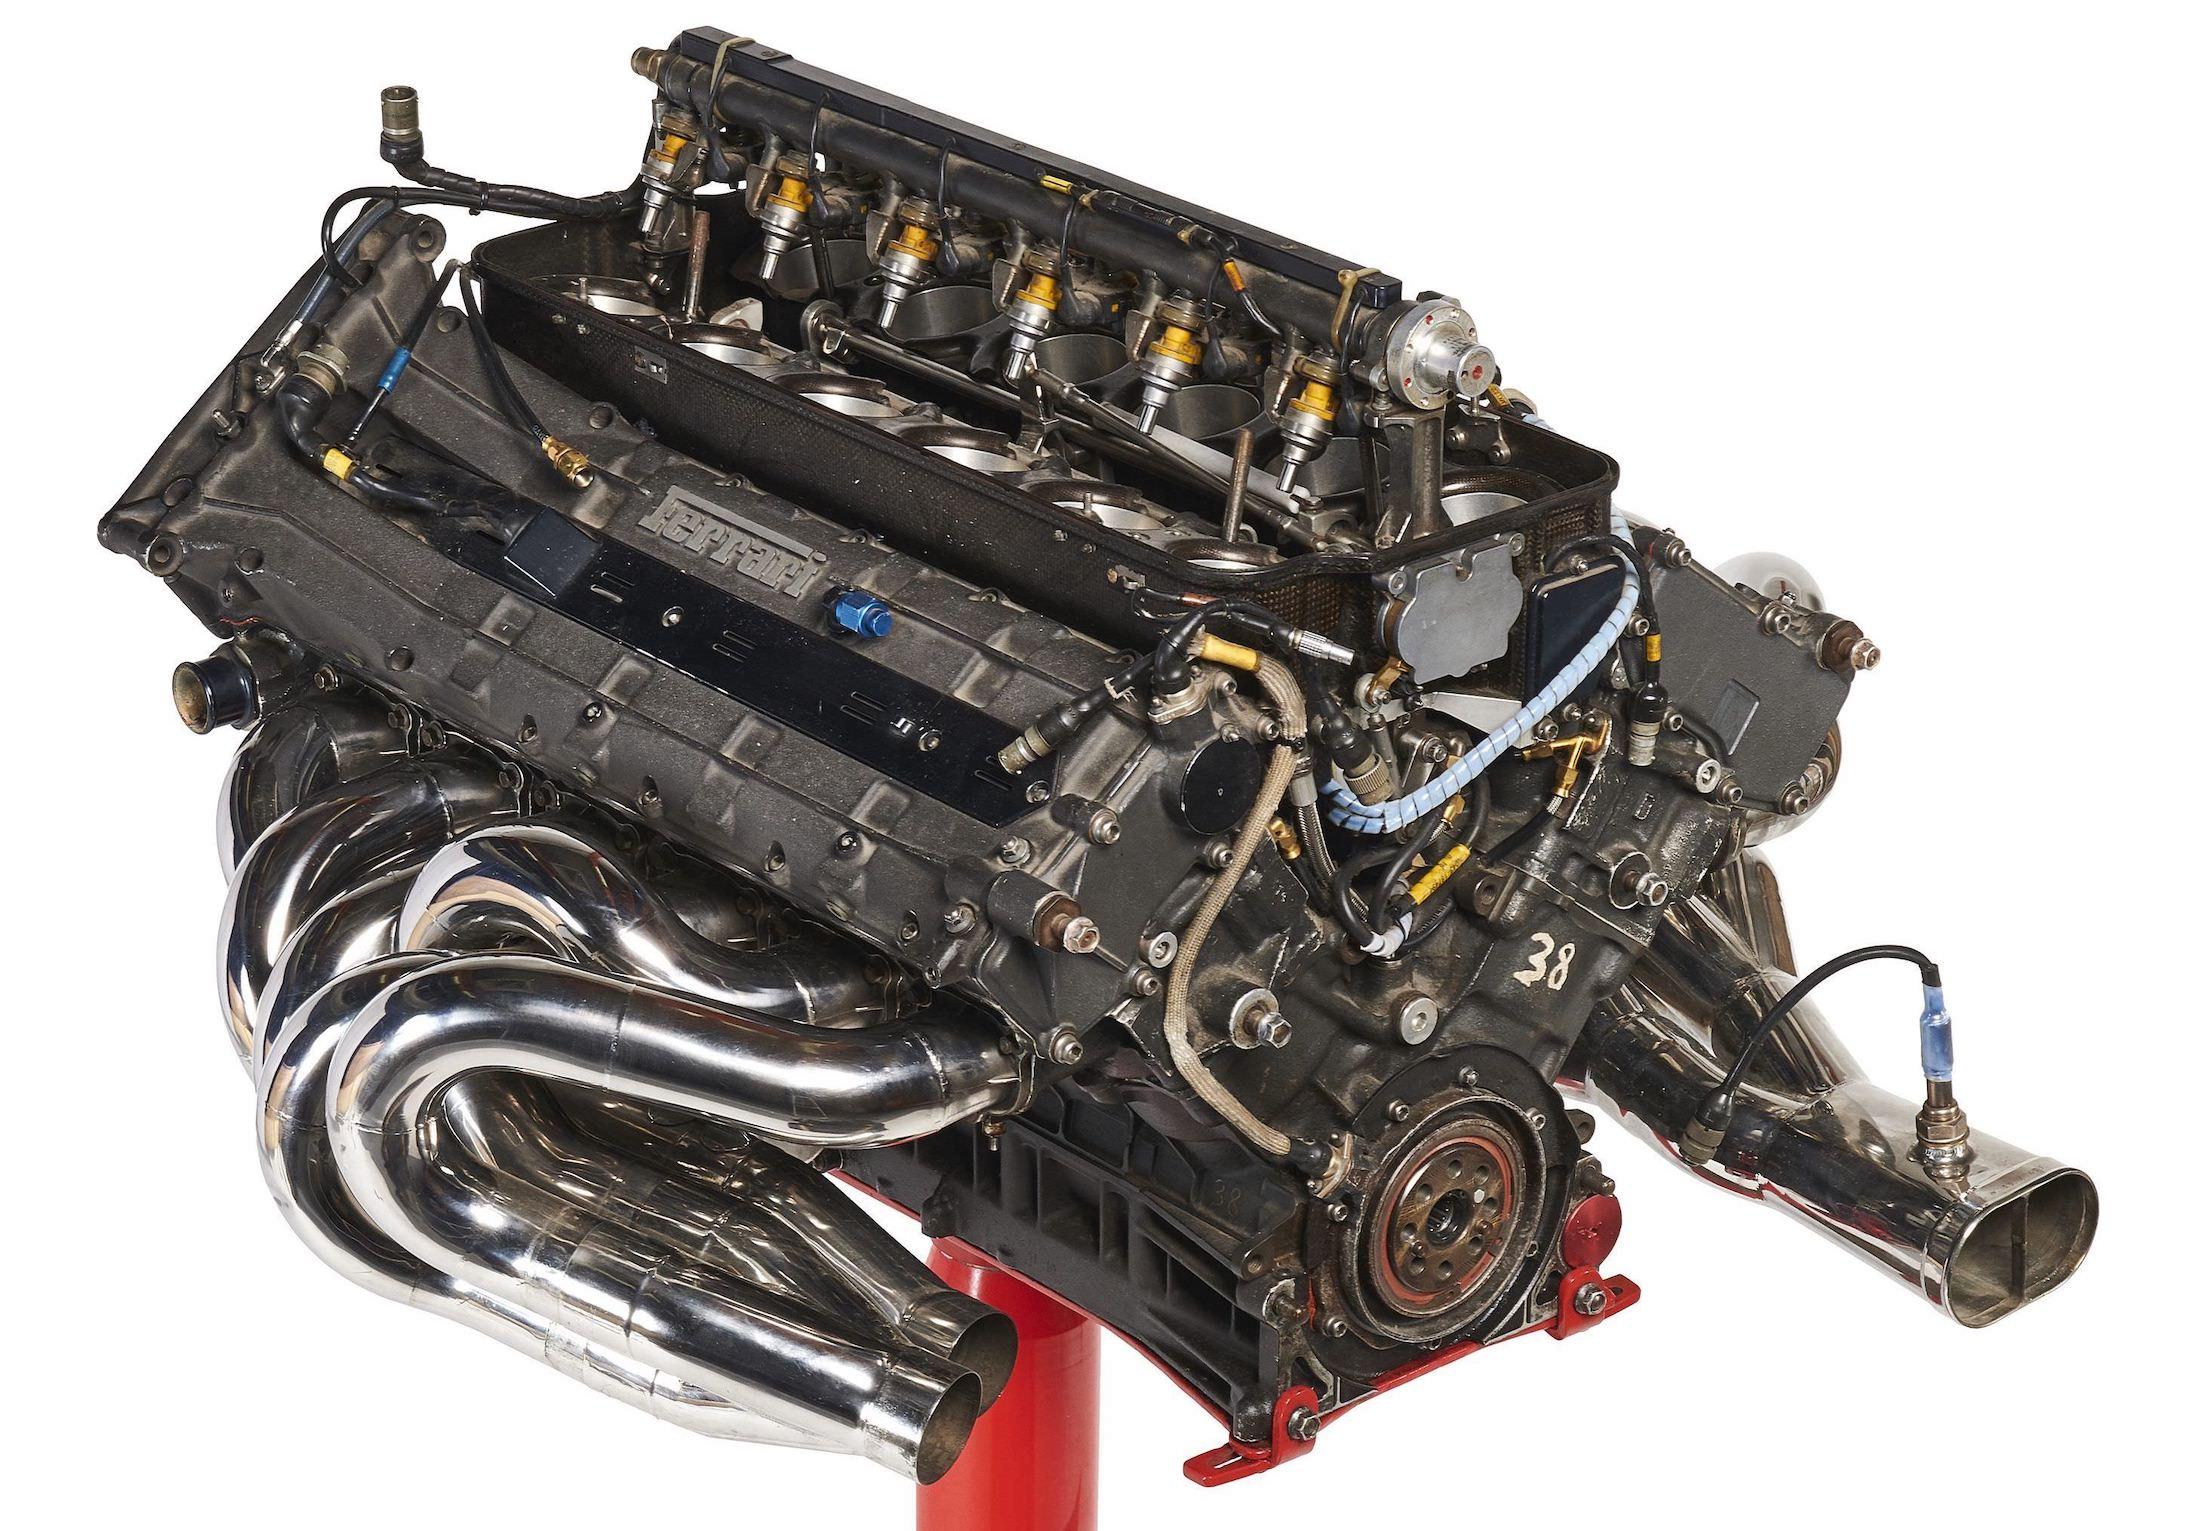 For Sale A Ferrari 3000 044 1 V12 Formula 1 Engine